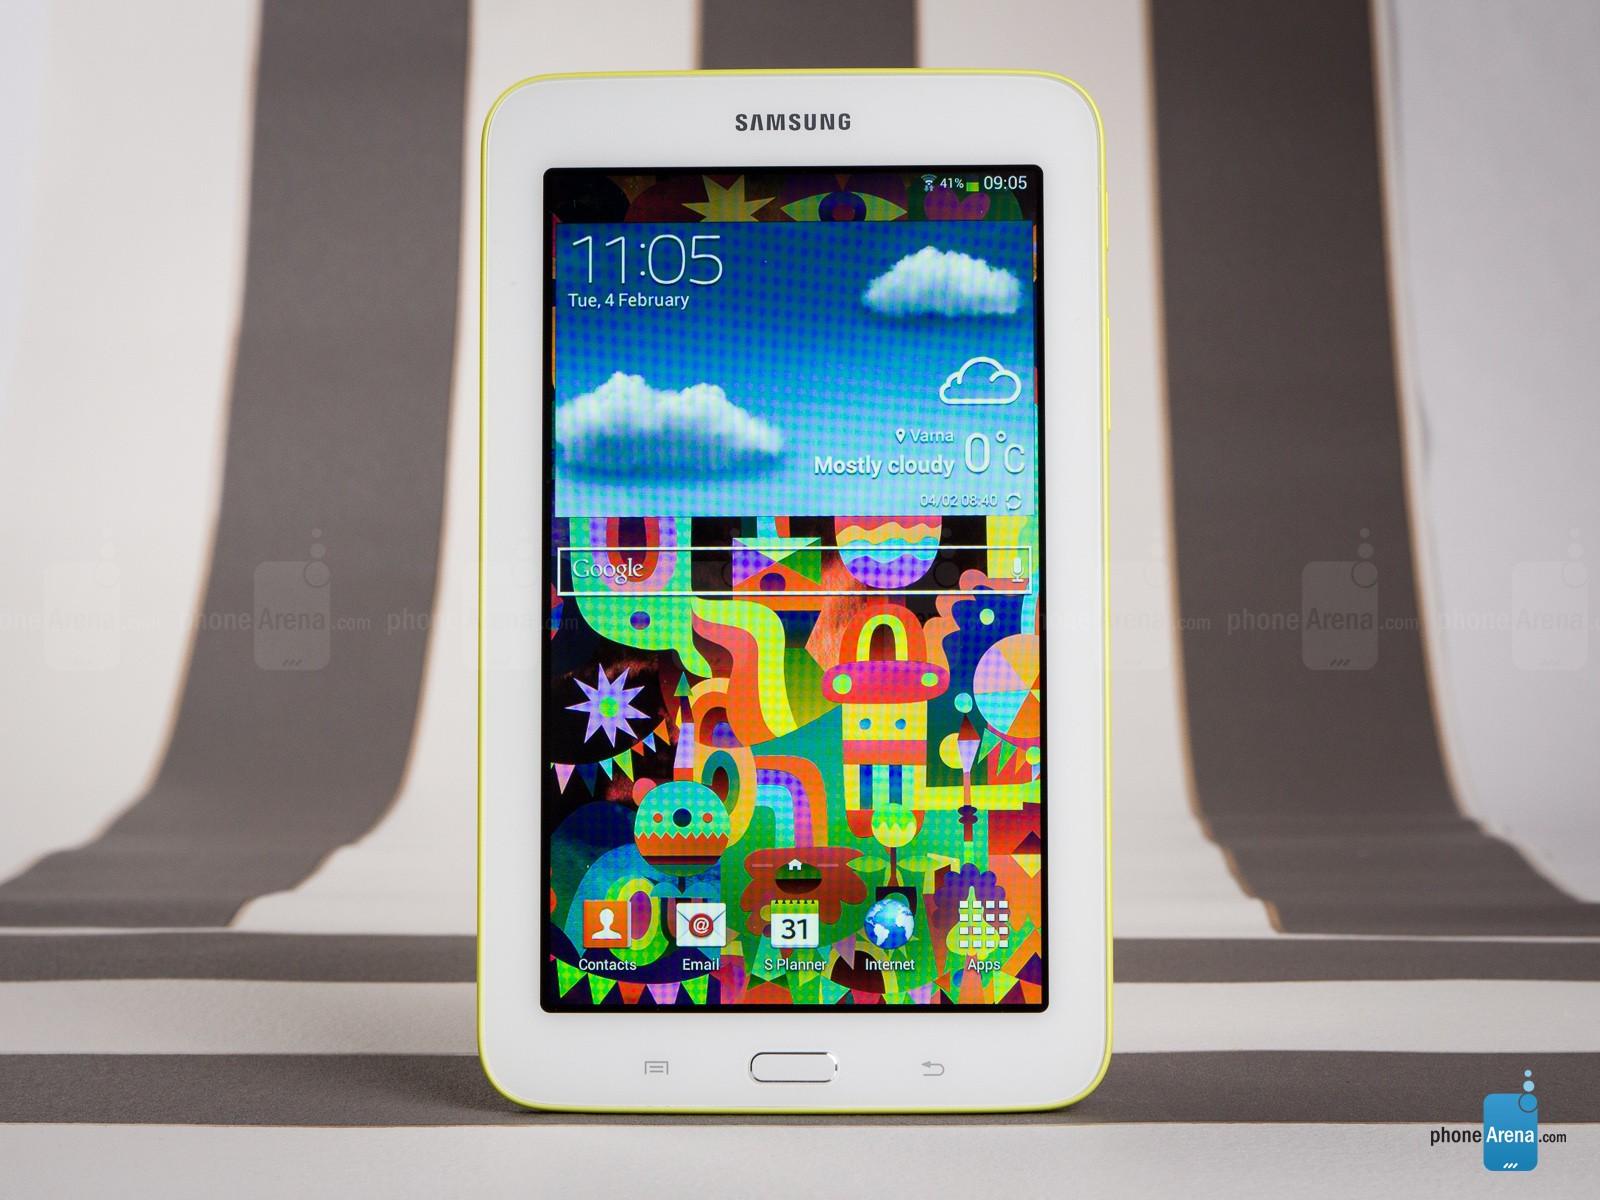 Samsung Galaxy Tab 3 Lite Preview 009 - Samsung Galaxy Tab 3 Lite giá 5 triệu đồng